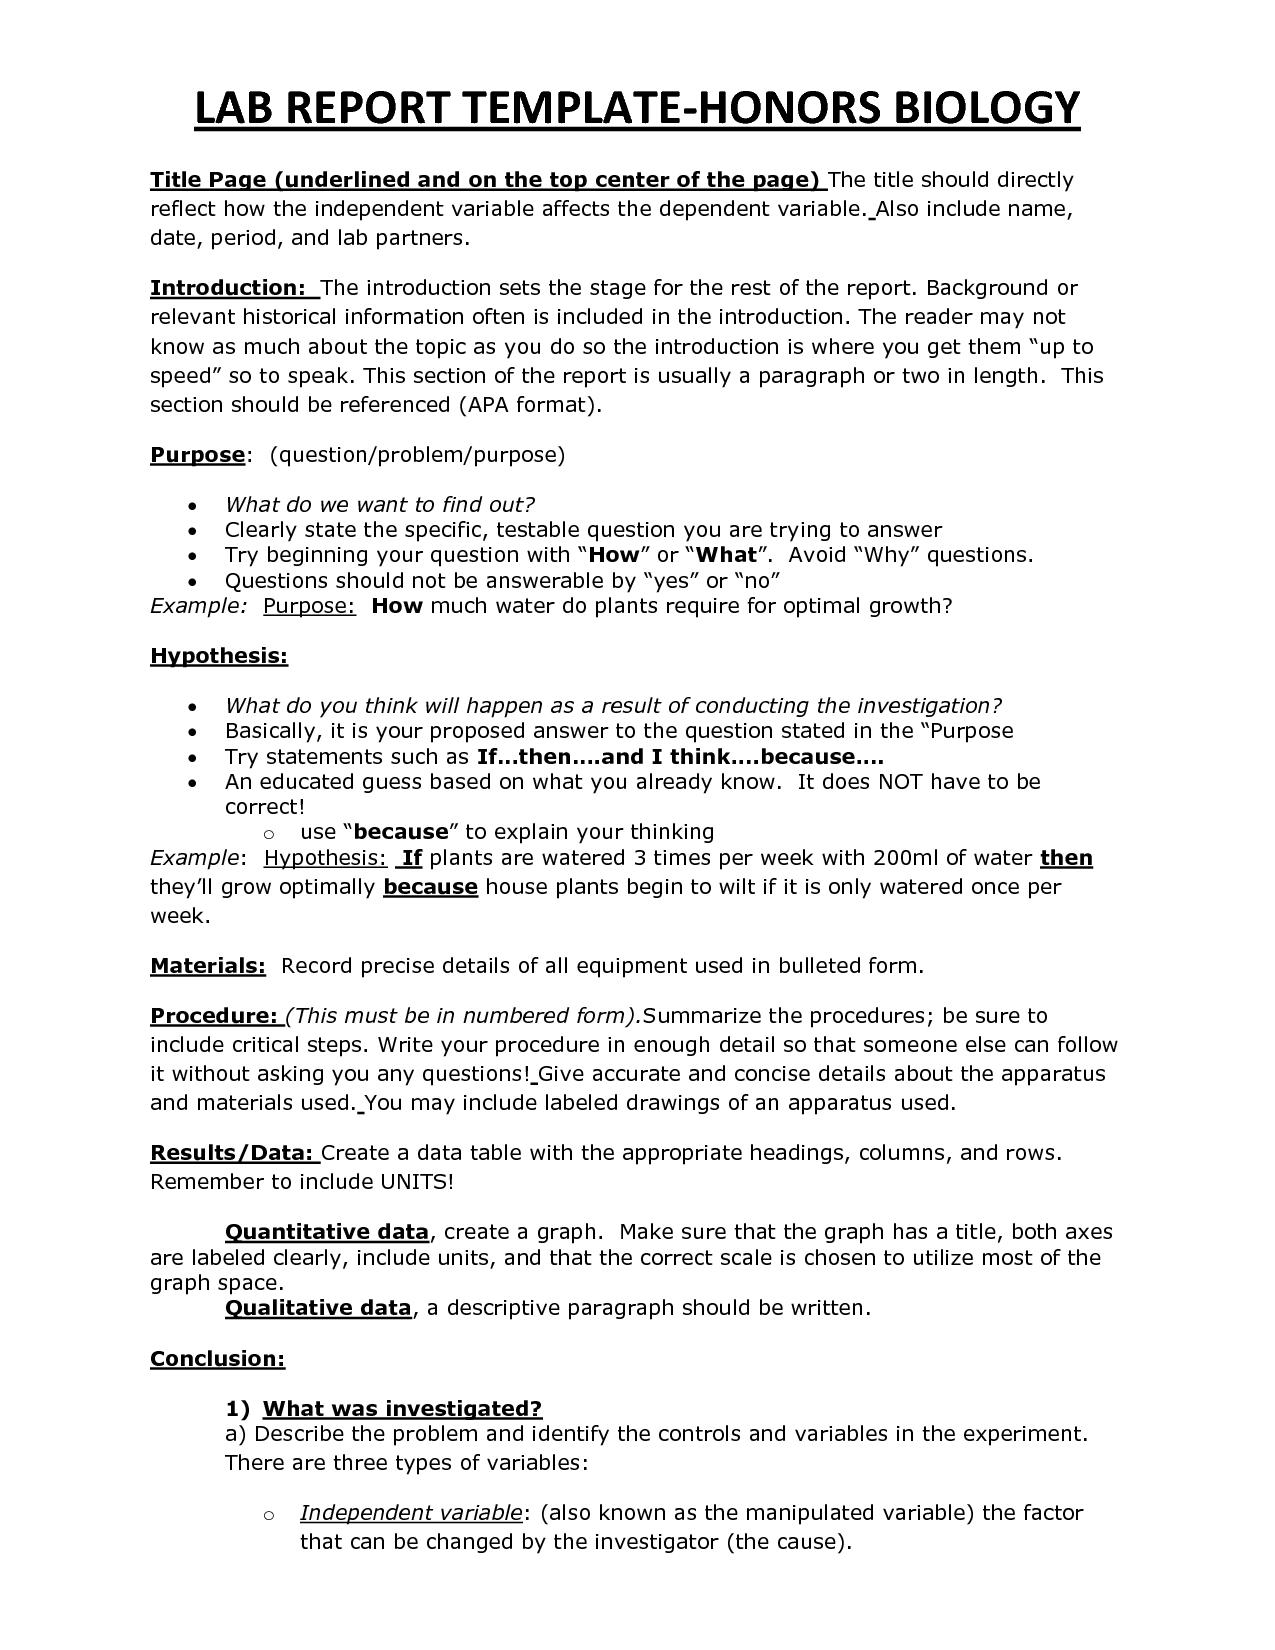 CHS HBio Lab Report Template  Biology  Lab report